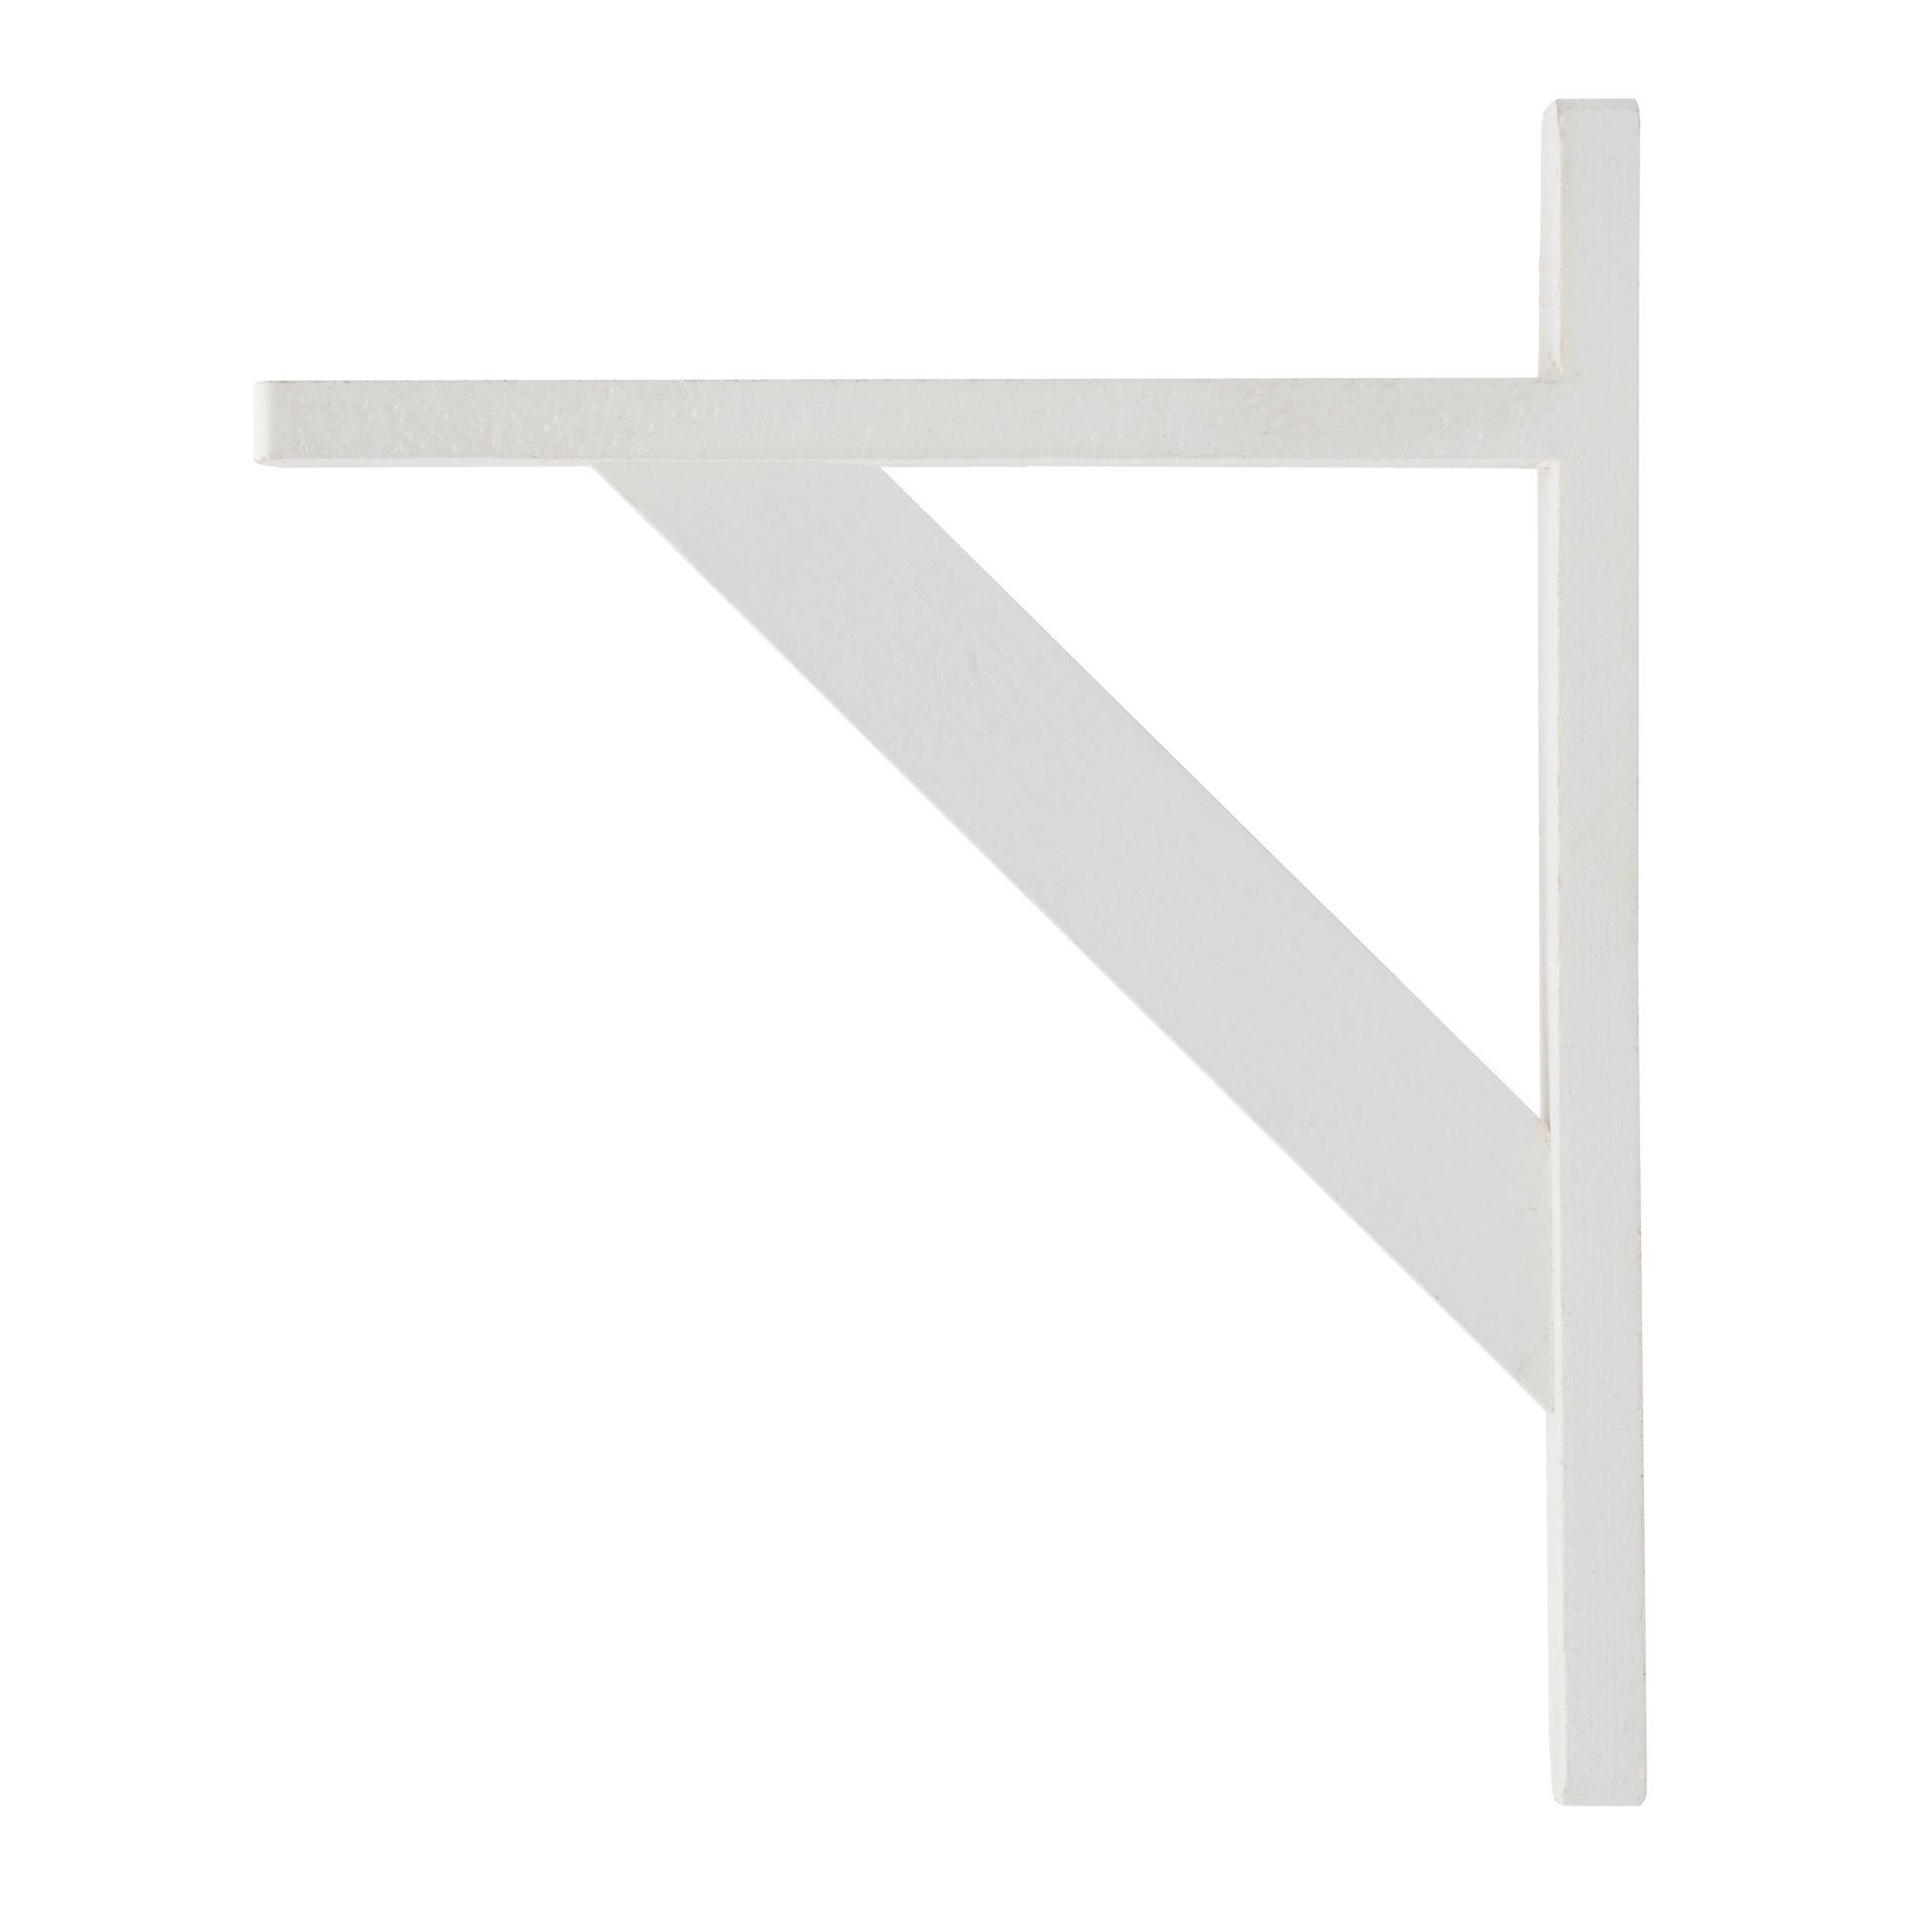 B&q Brackets White Matt Wood Shelf Bracket (d)250mm